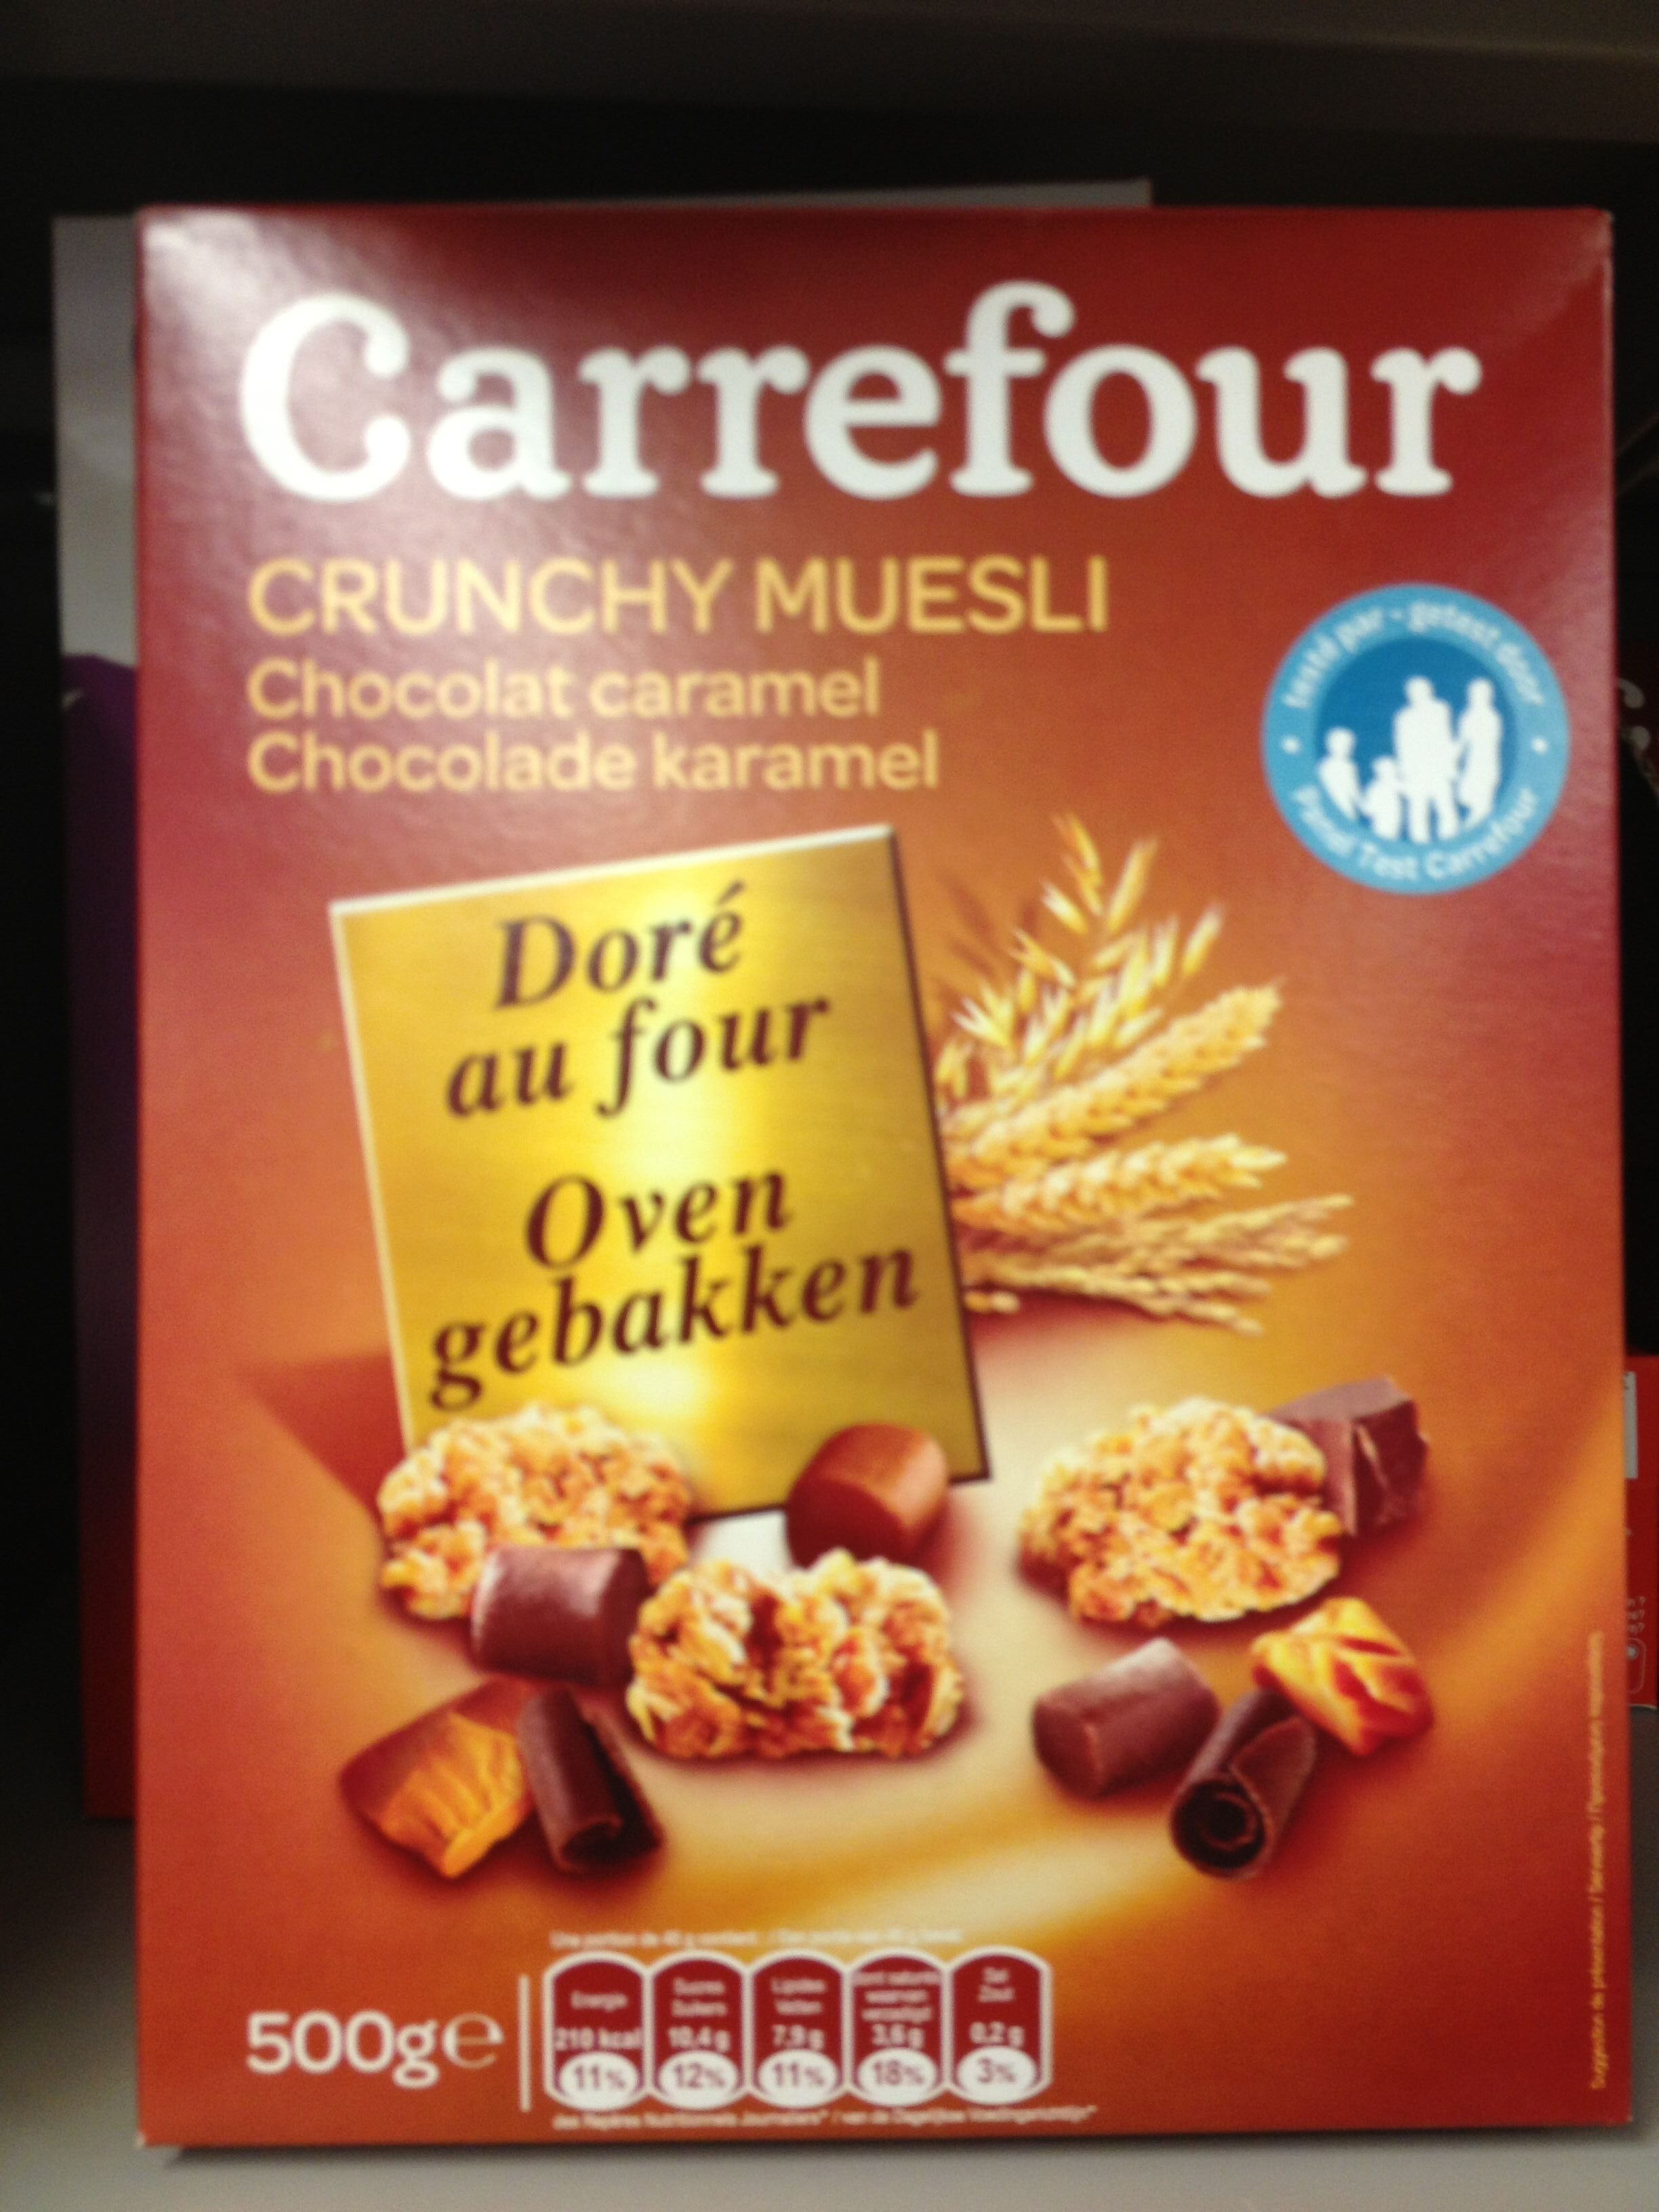 Crunchy Muesli Chocolat caramel Doré au four - Product